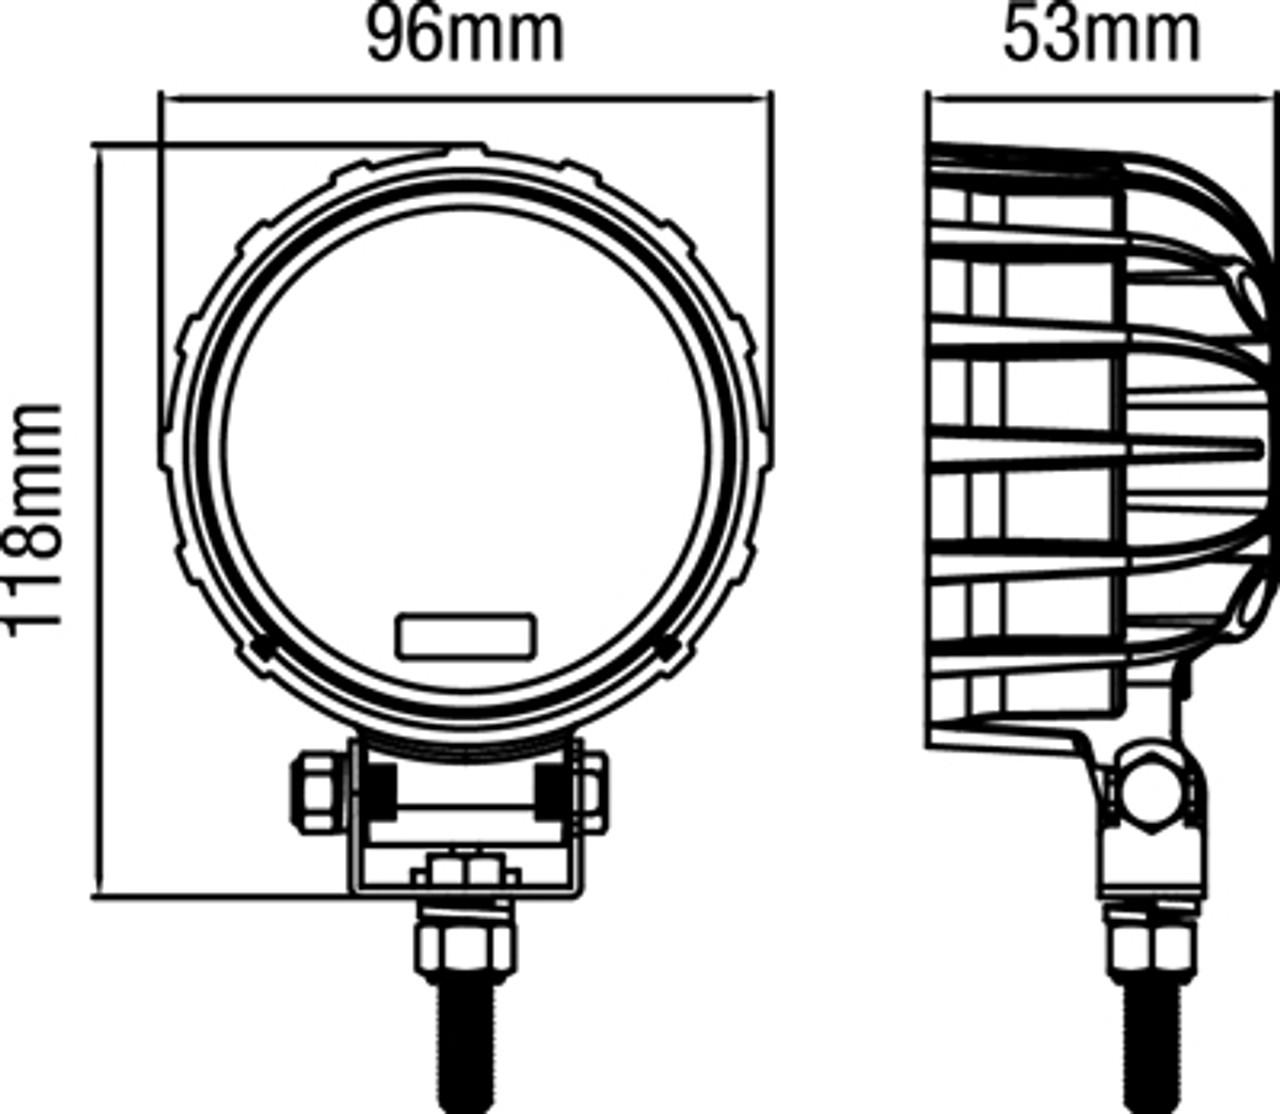 MARINE GRADE LED LIGHT. FLOOD BEAM. 16 Watt.4 inch Round